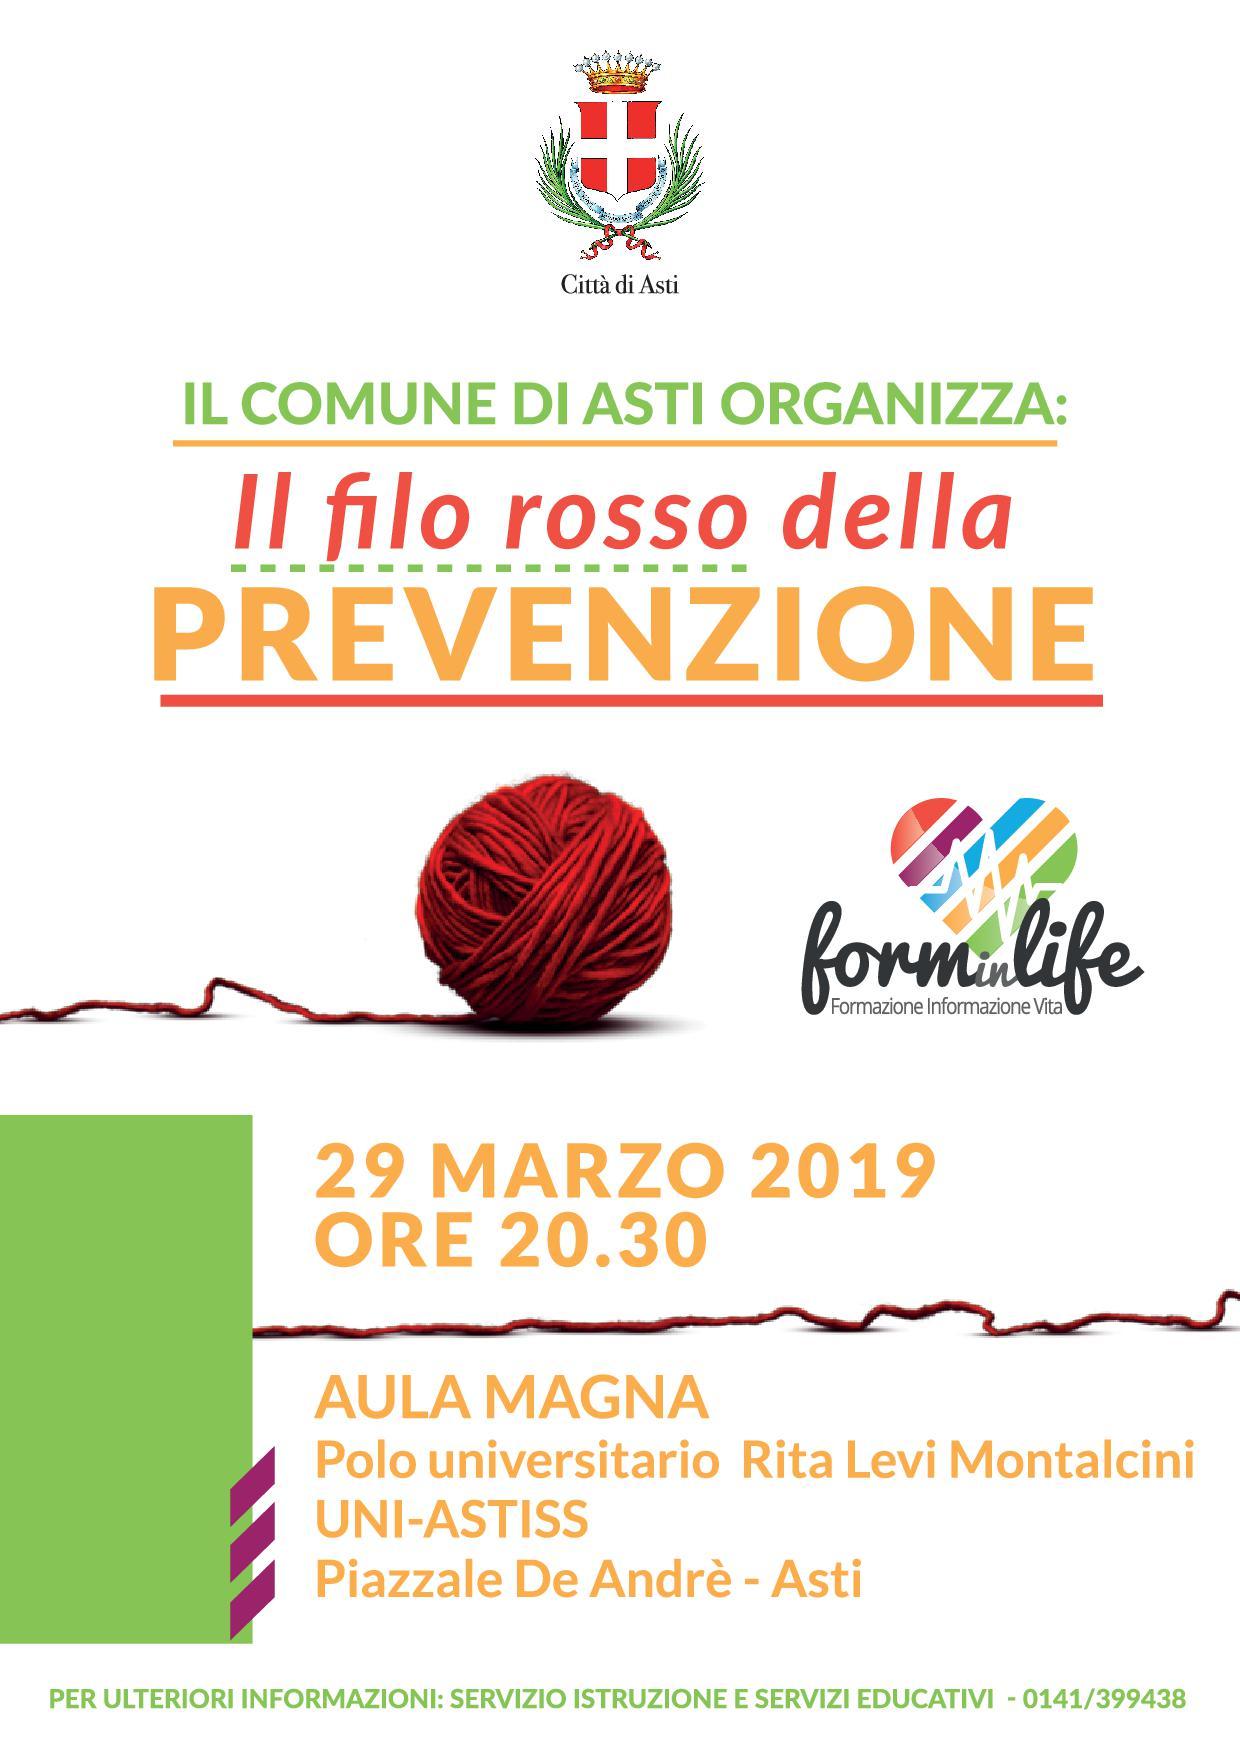 http://www.fondlhs.org/wp-content/uploads/2019/03/A3_evento-29-marzo-corretta.jpg